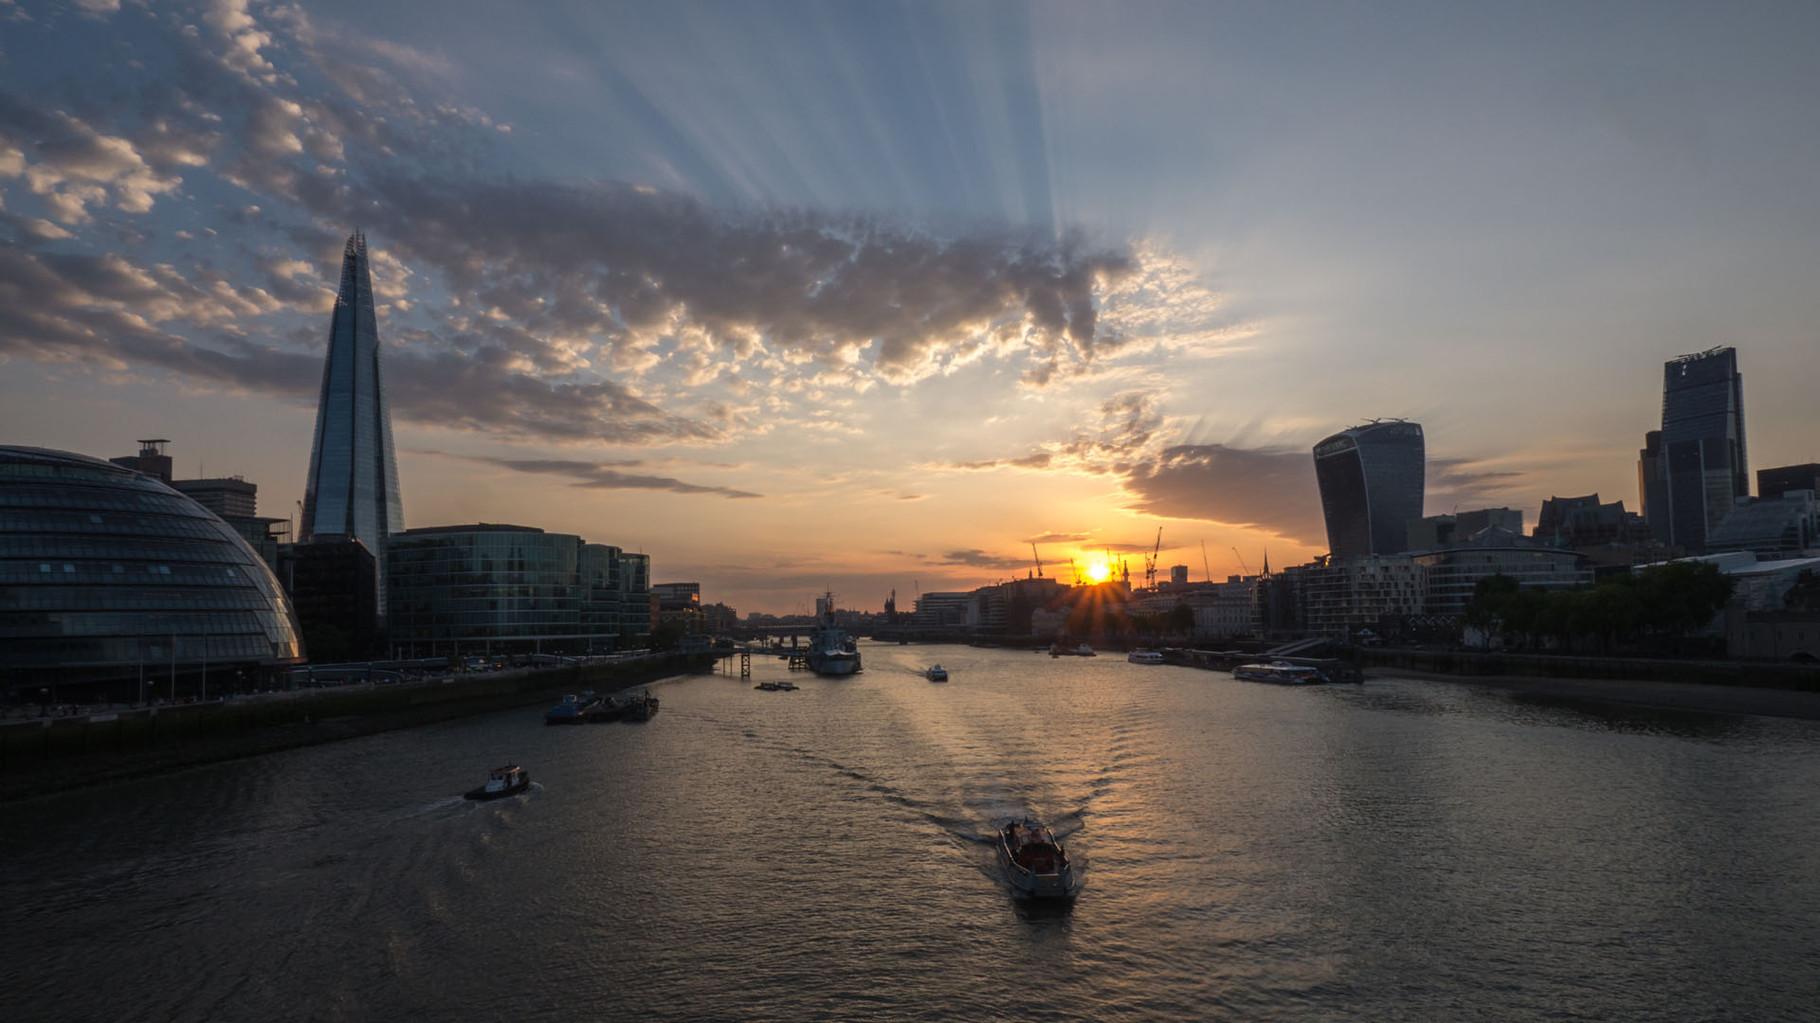 Sunset Tower bridge, London